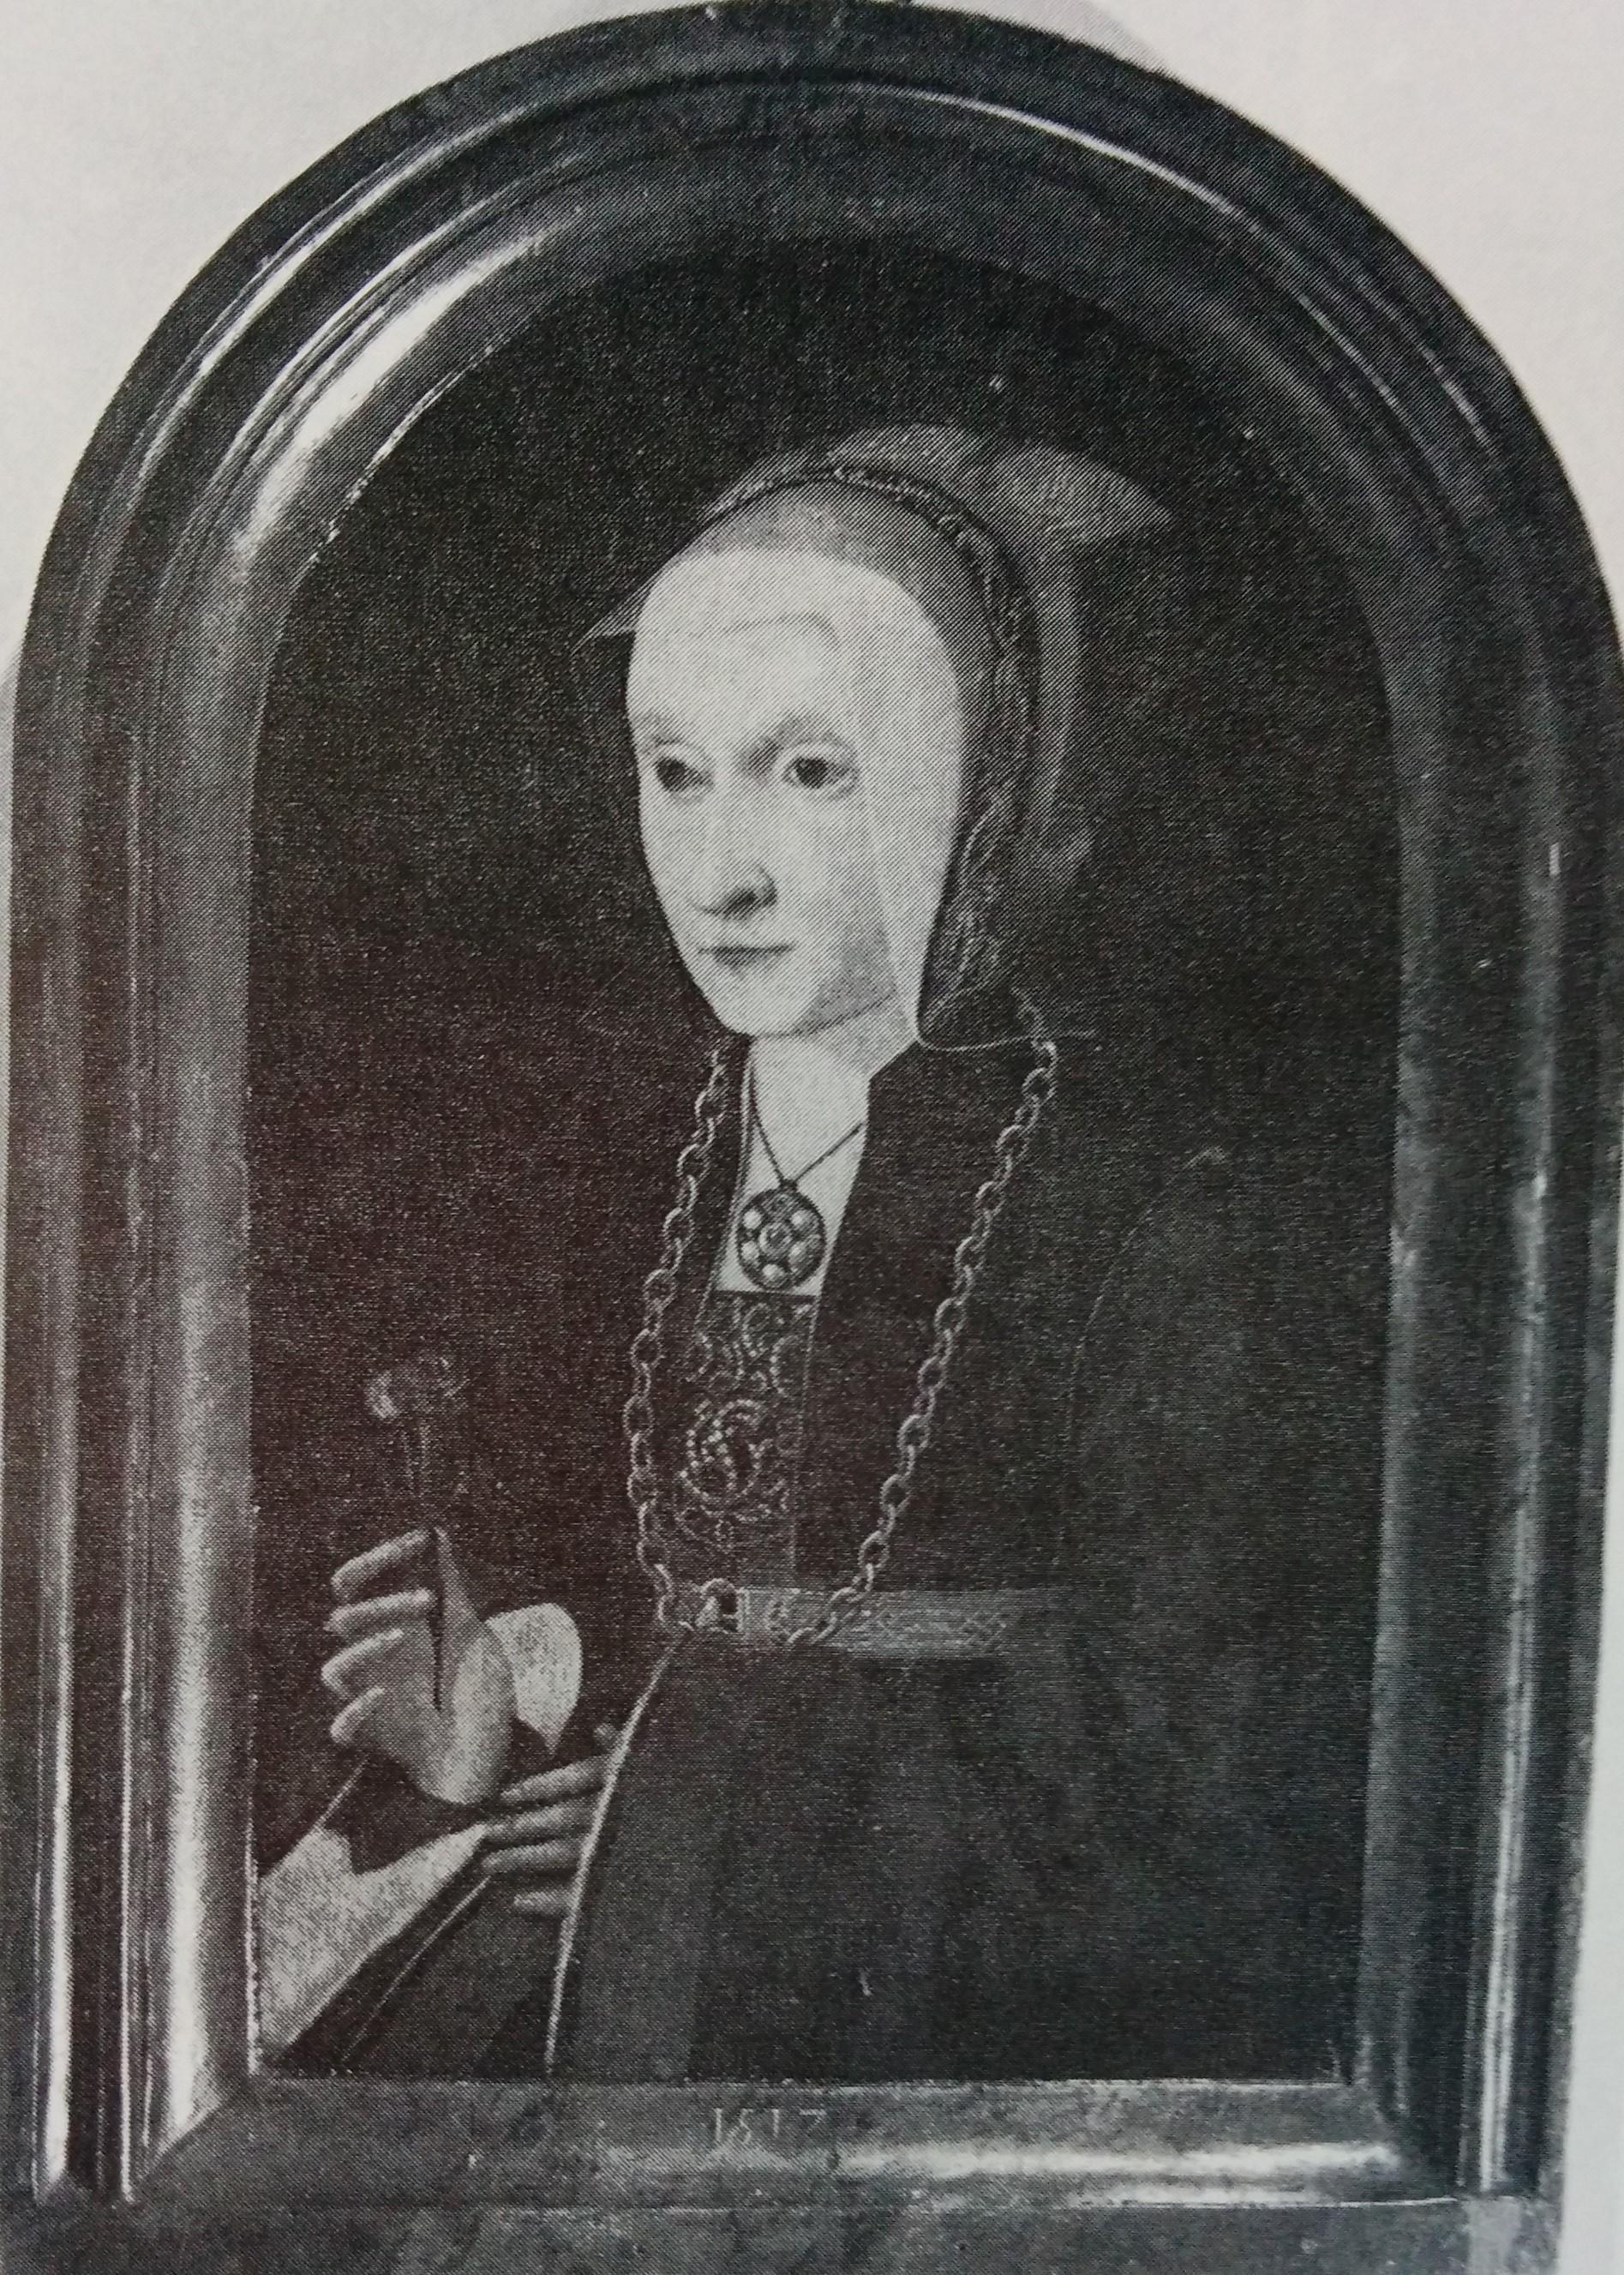 Barthel Bruyn l'Ancien 1517 portrait de femme